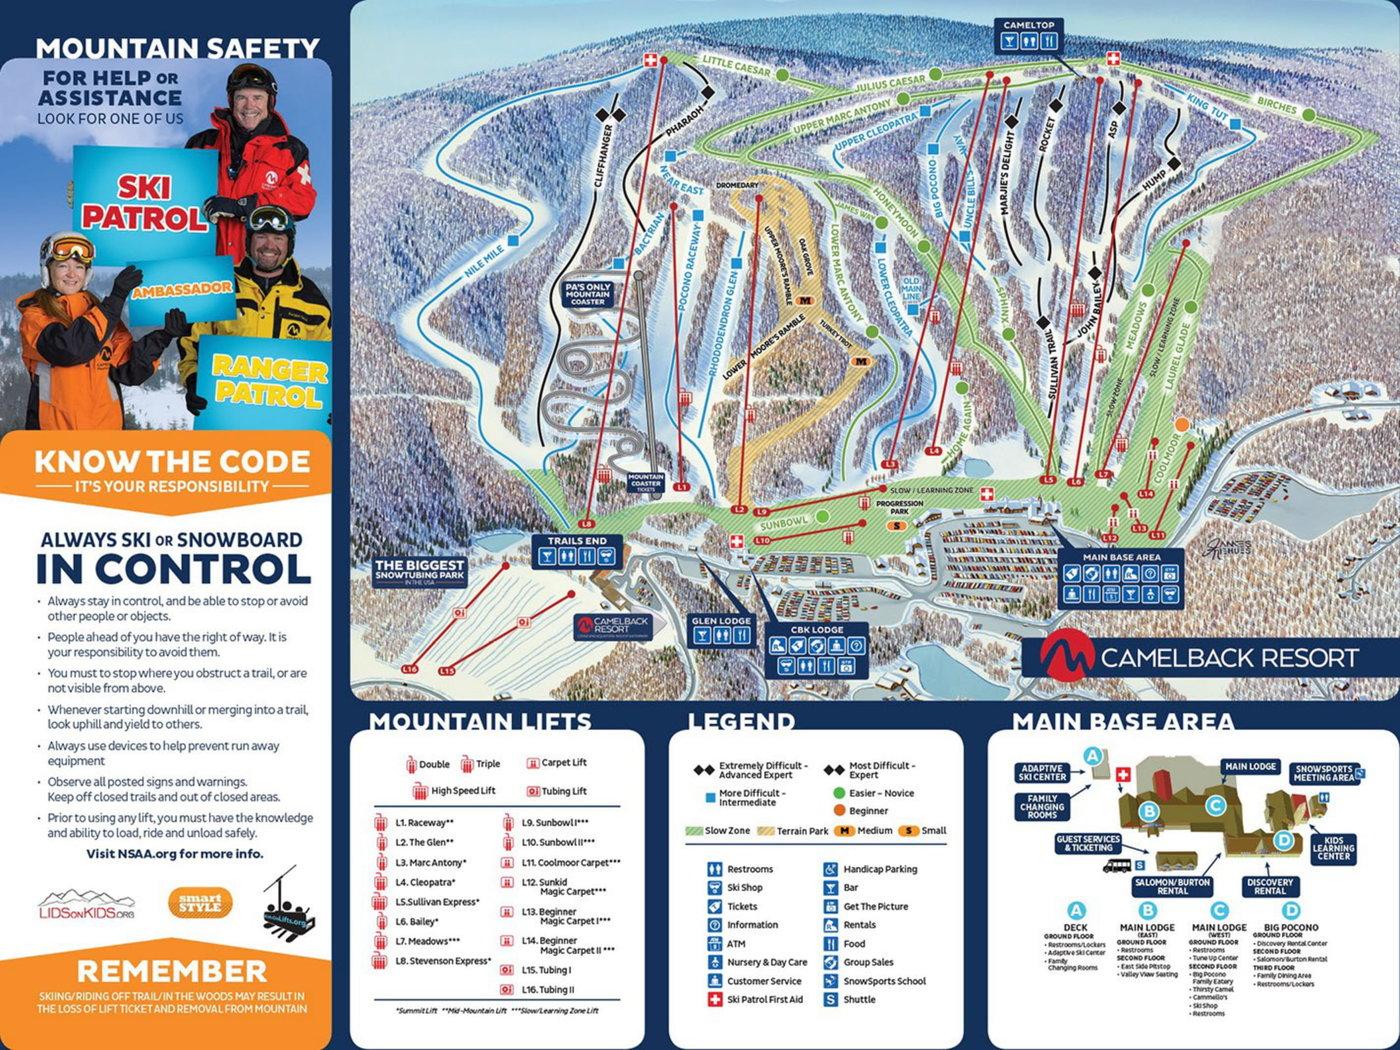 Camelback Mountain Resort Trail Map